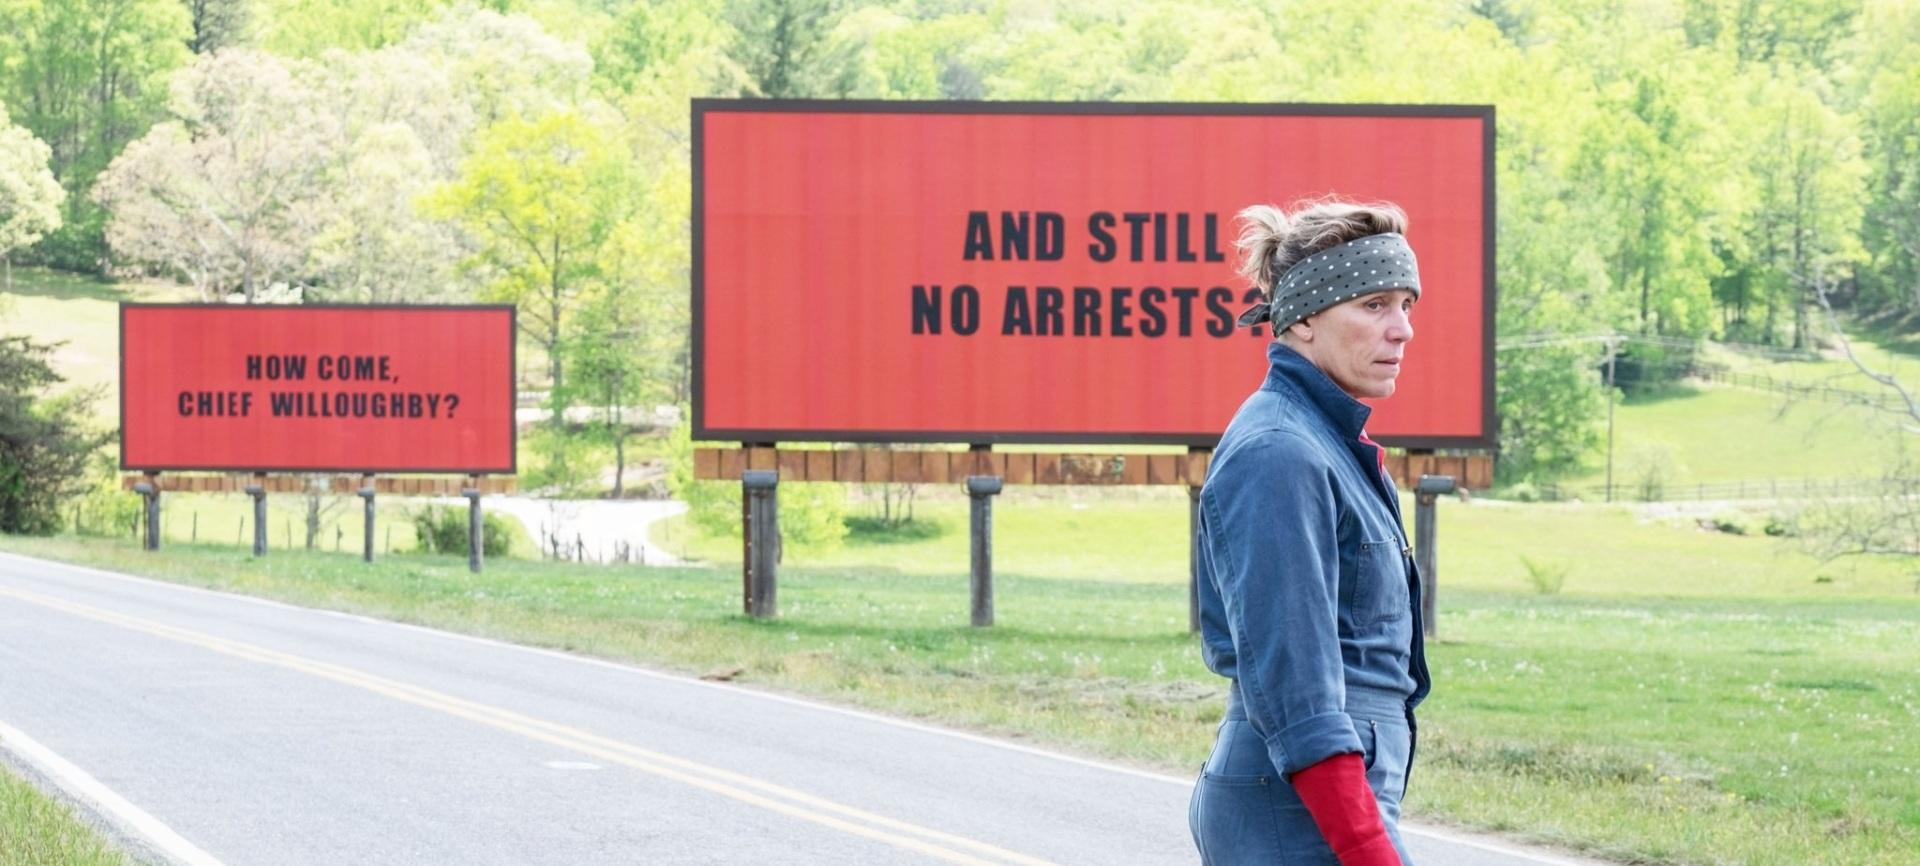 Tre manifesti a Ebbing, Missouri - CineFatti